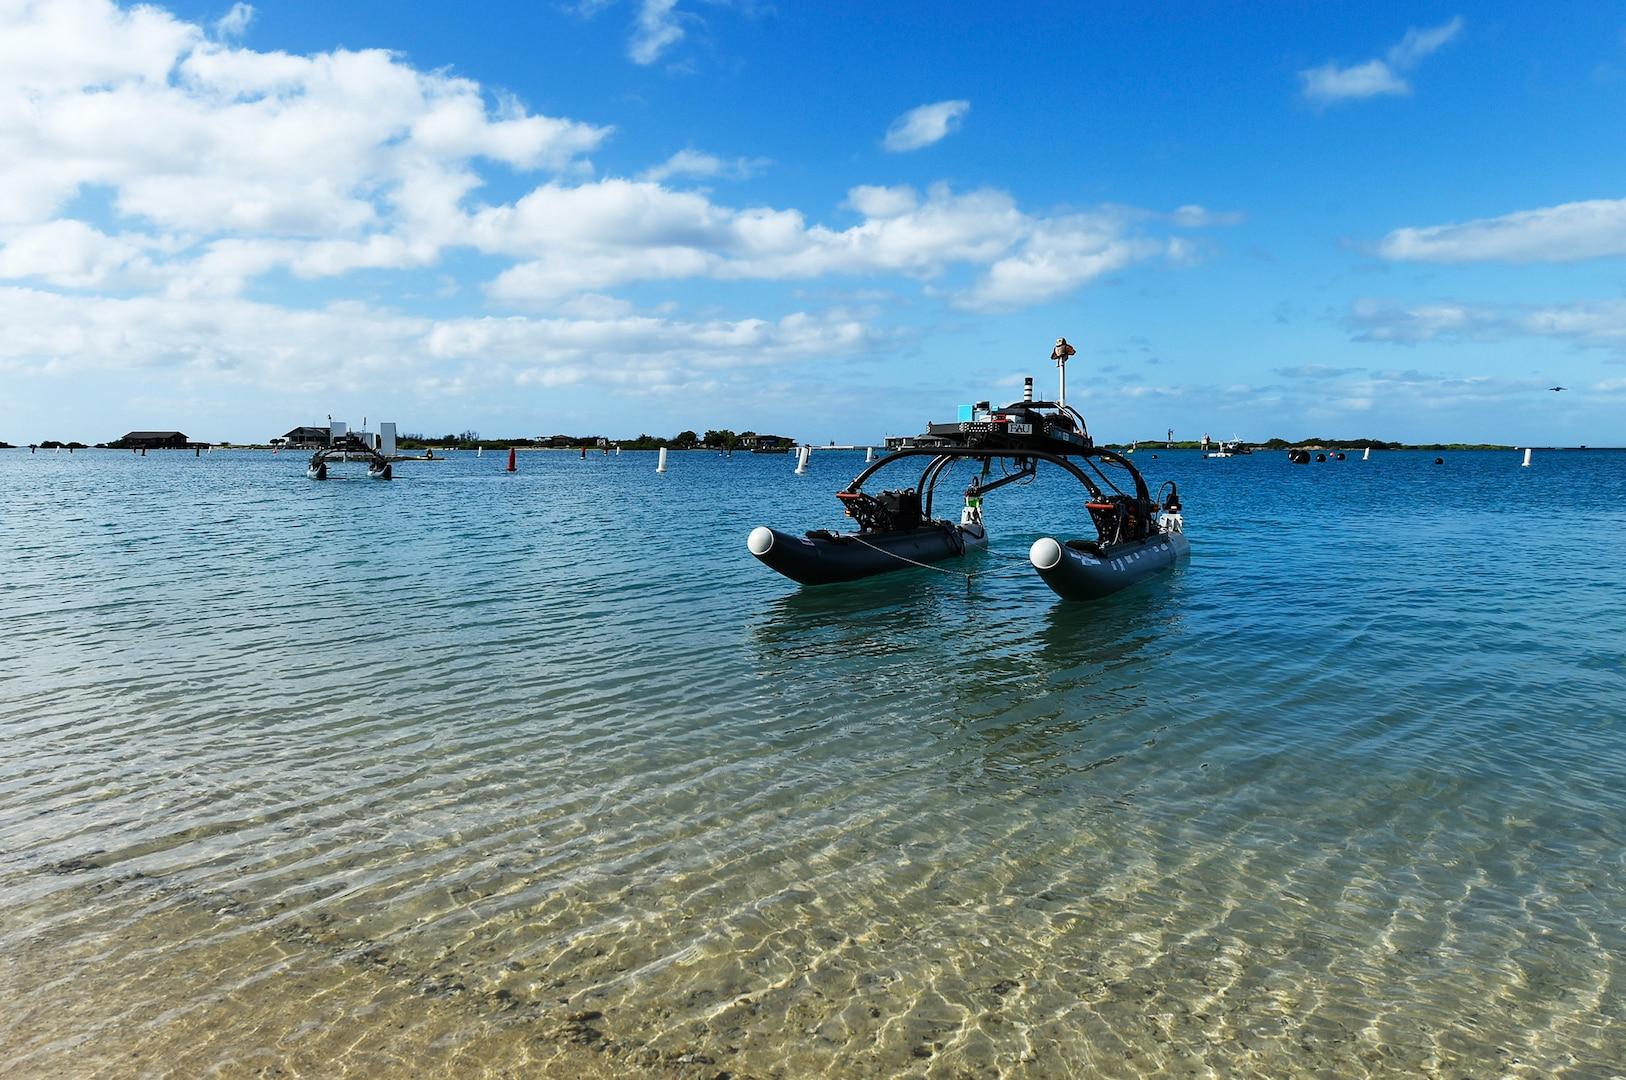 Owltonomous, autonomous surface vehicle from Florida Atlantic University, competes during Office of Naval Research–sponsored Maritime RobotX Challenge, Honolulu, Hawaii, December 14, 2018 (U.S. Navy/John F. Williams)